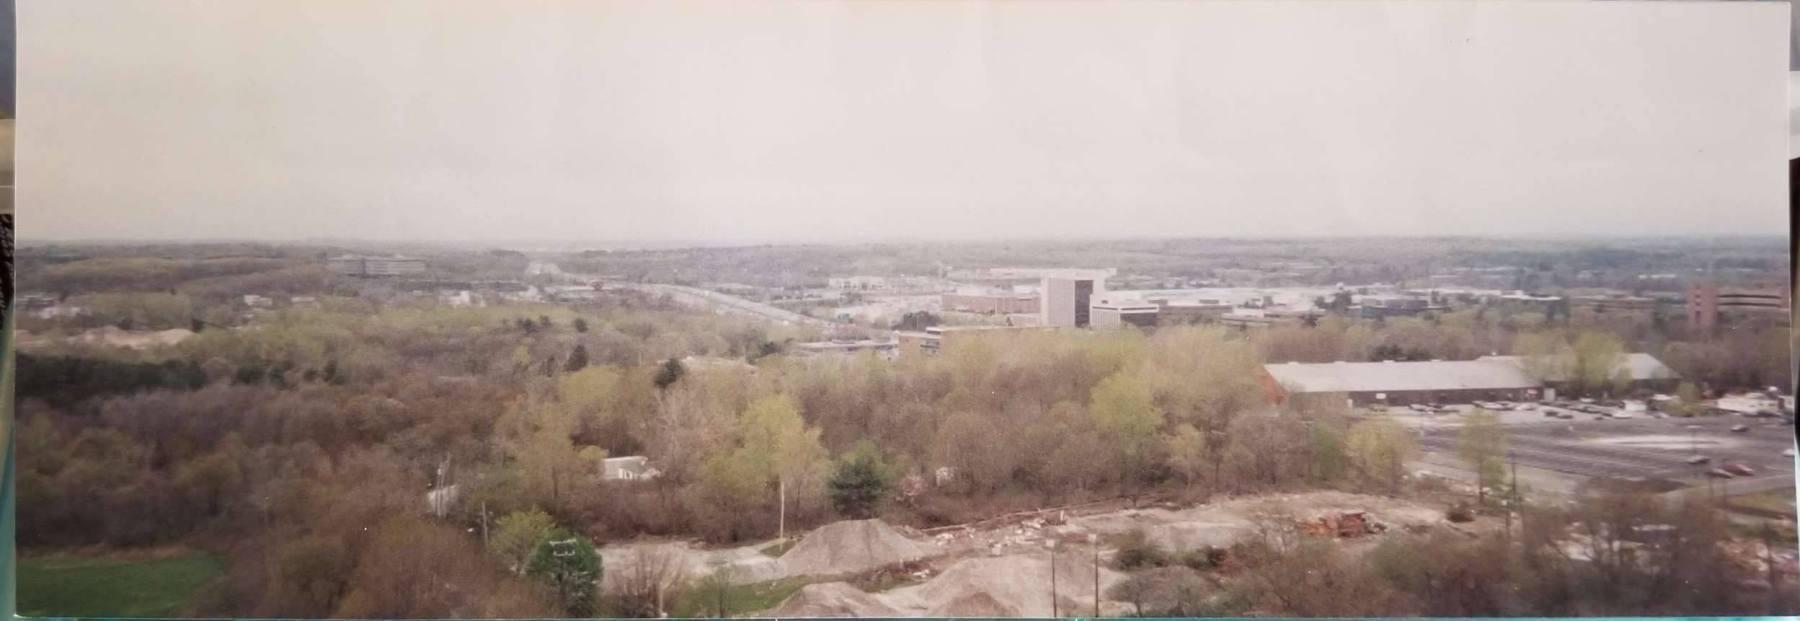 1999 panorama from Blanchard Rd. water tower, Burlington MA